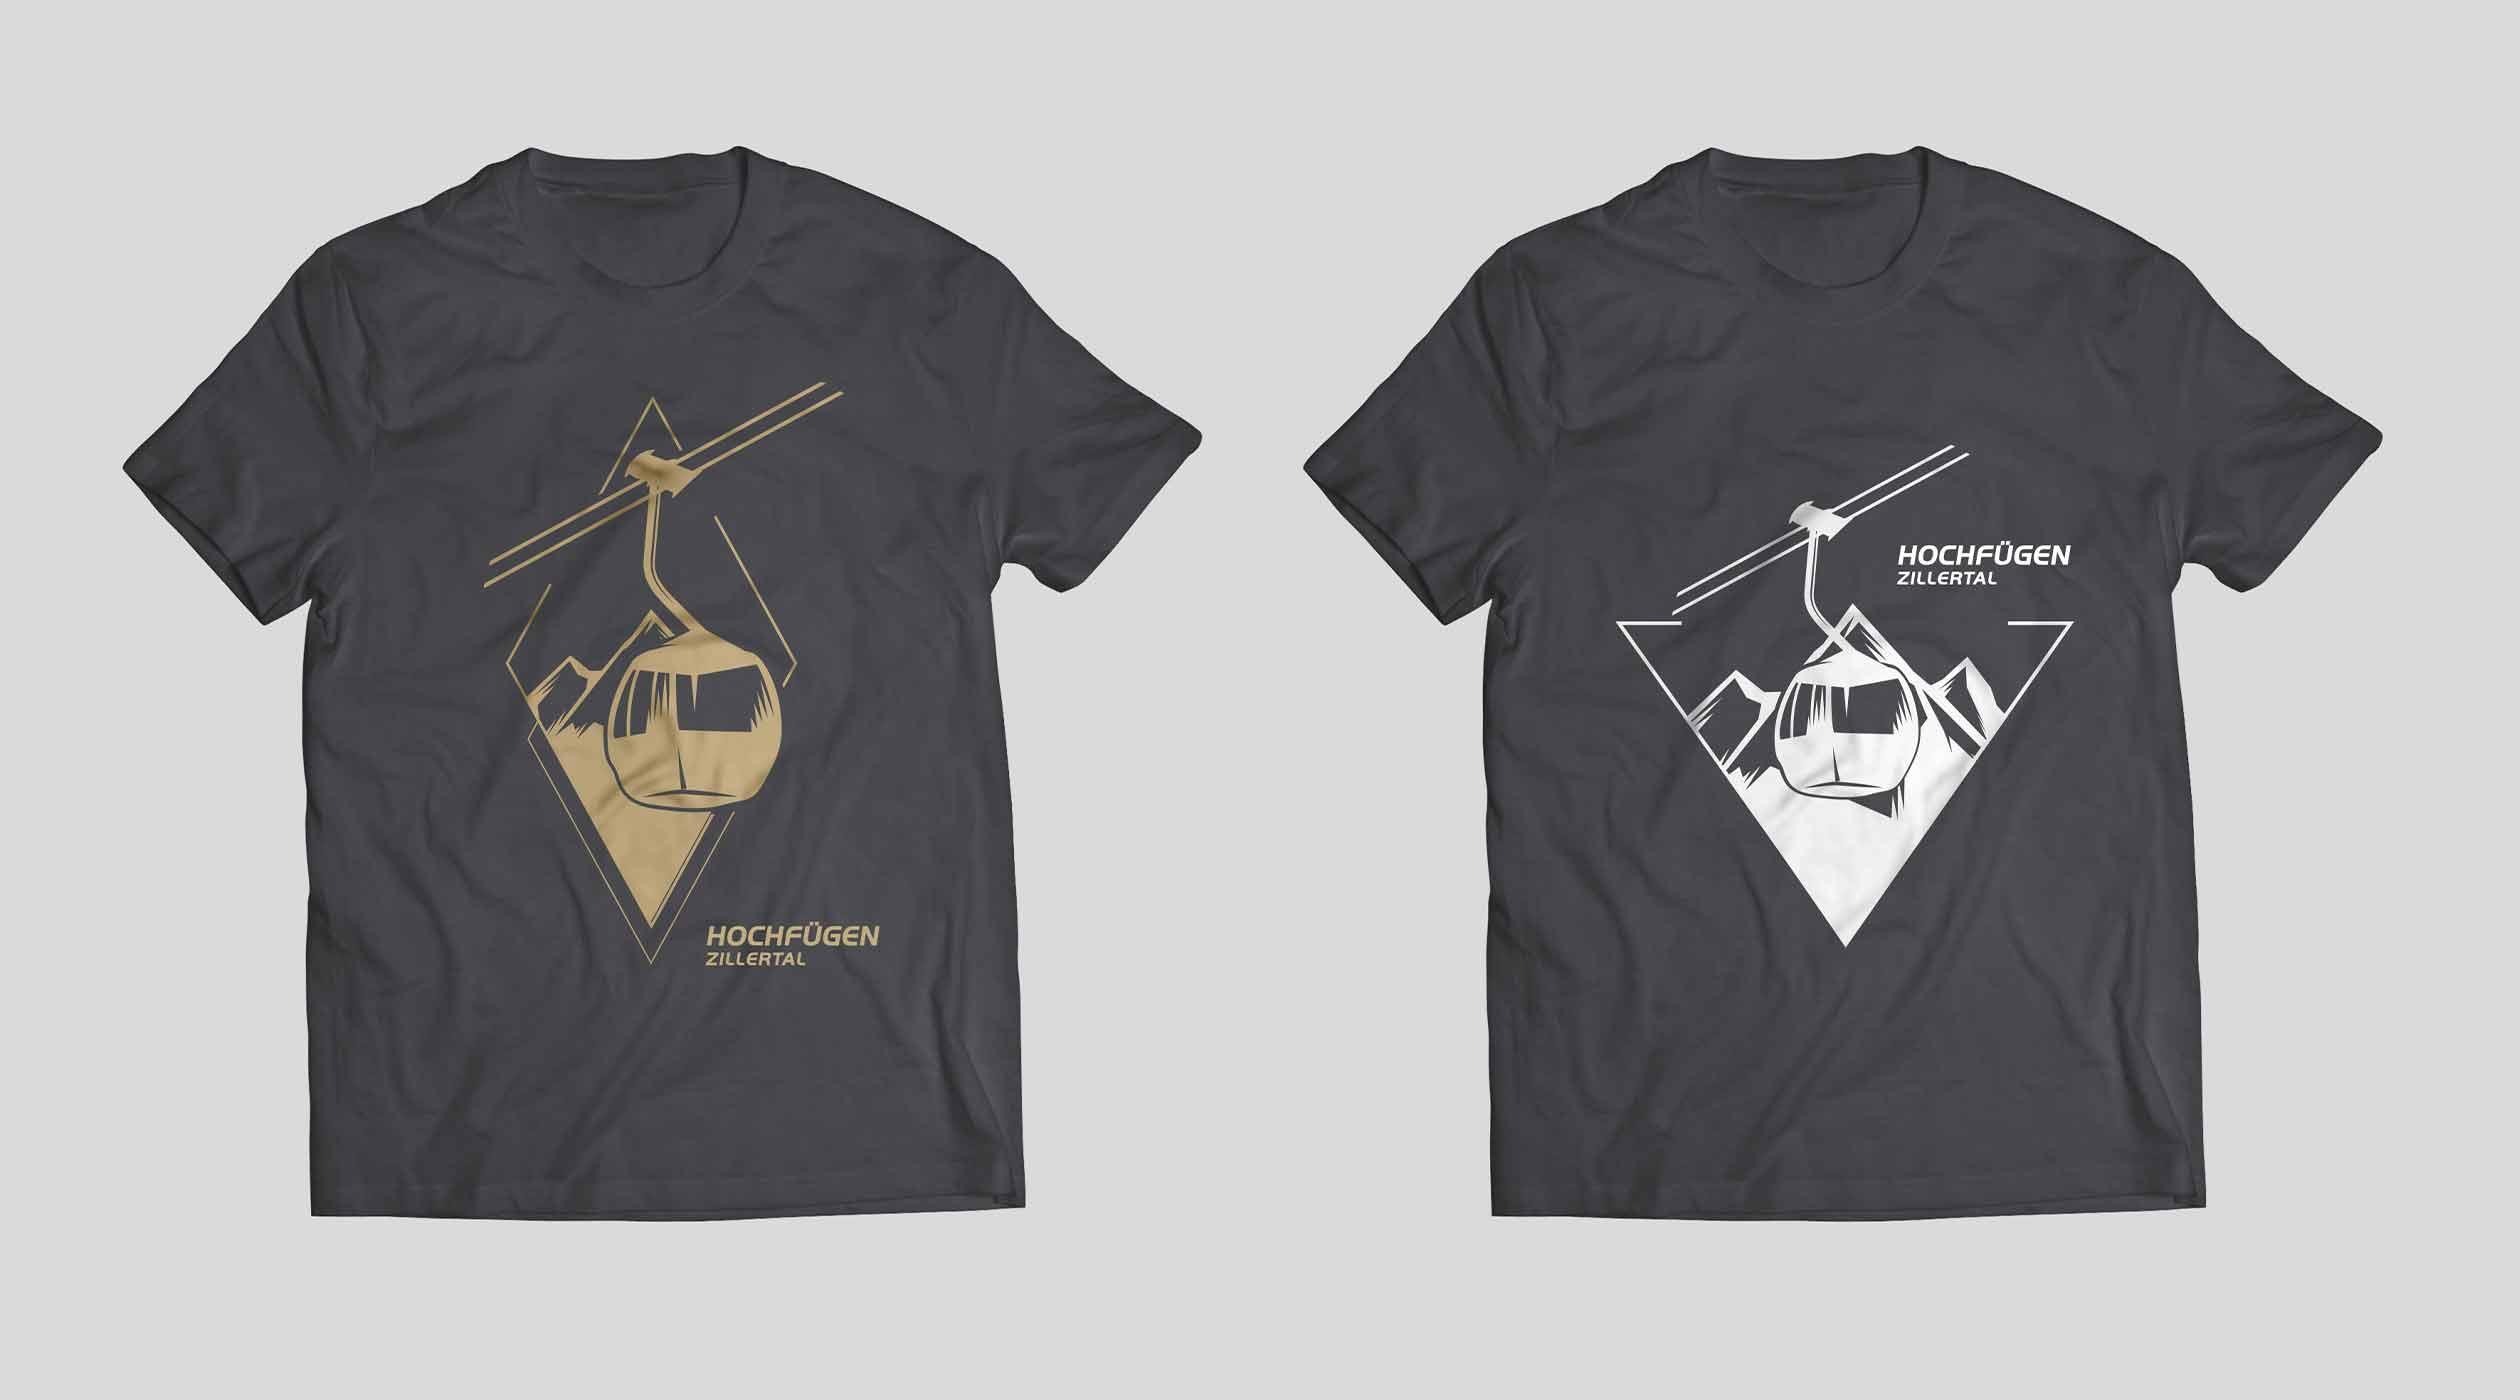 hochfuegen-shirts